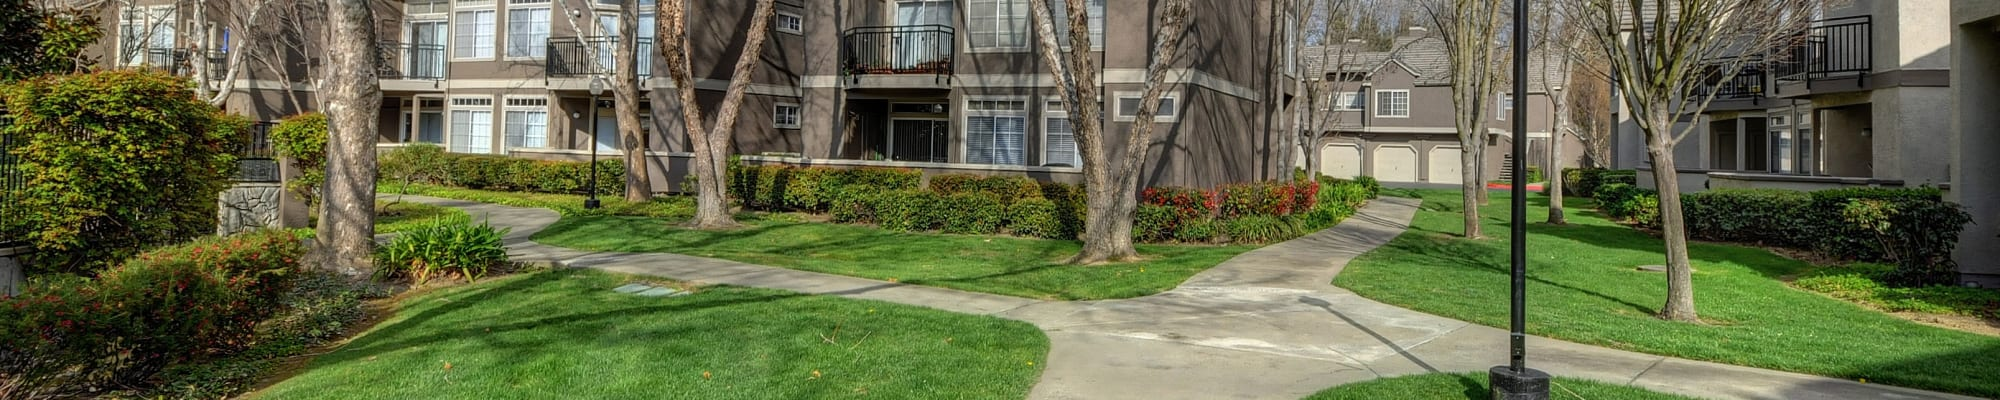 Reviews of Larkspur Woods in Sacramento, California